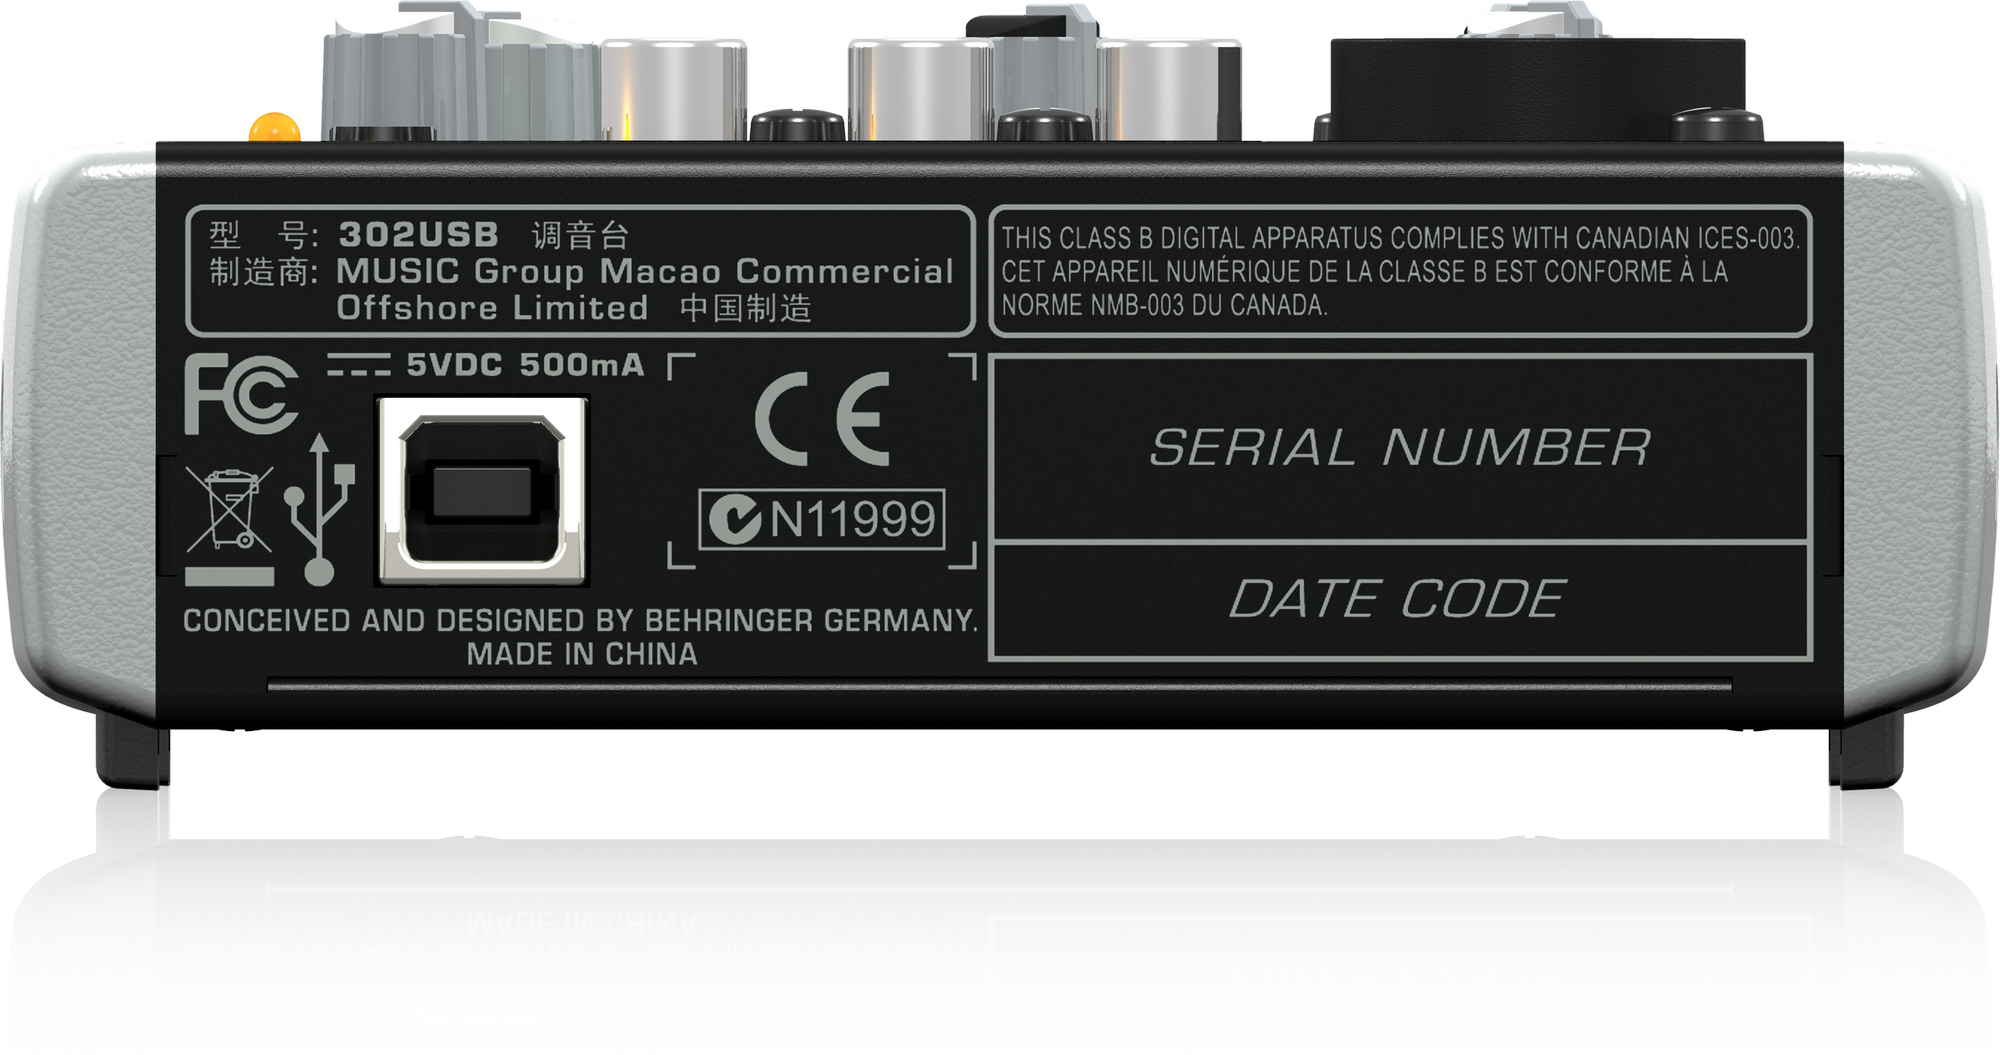 Behringer Xenyx 302USB - Analogue Mixer